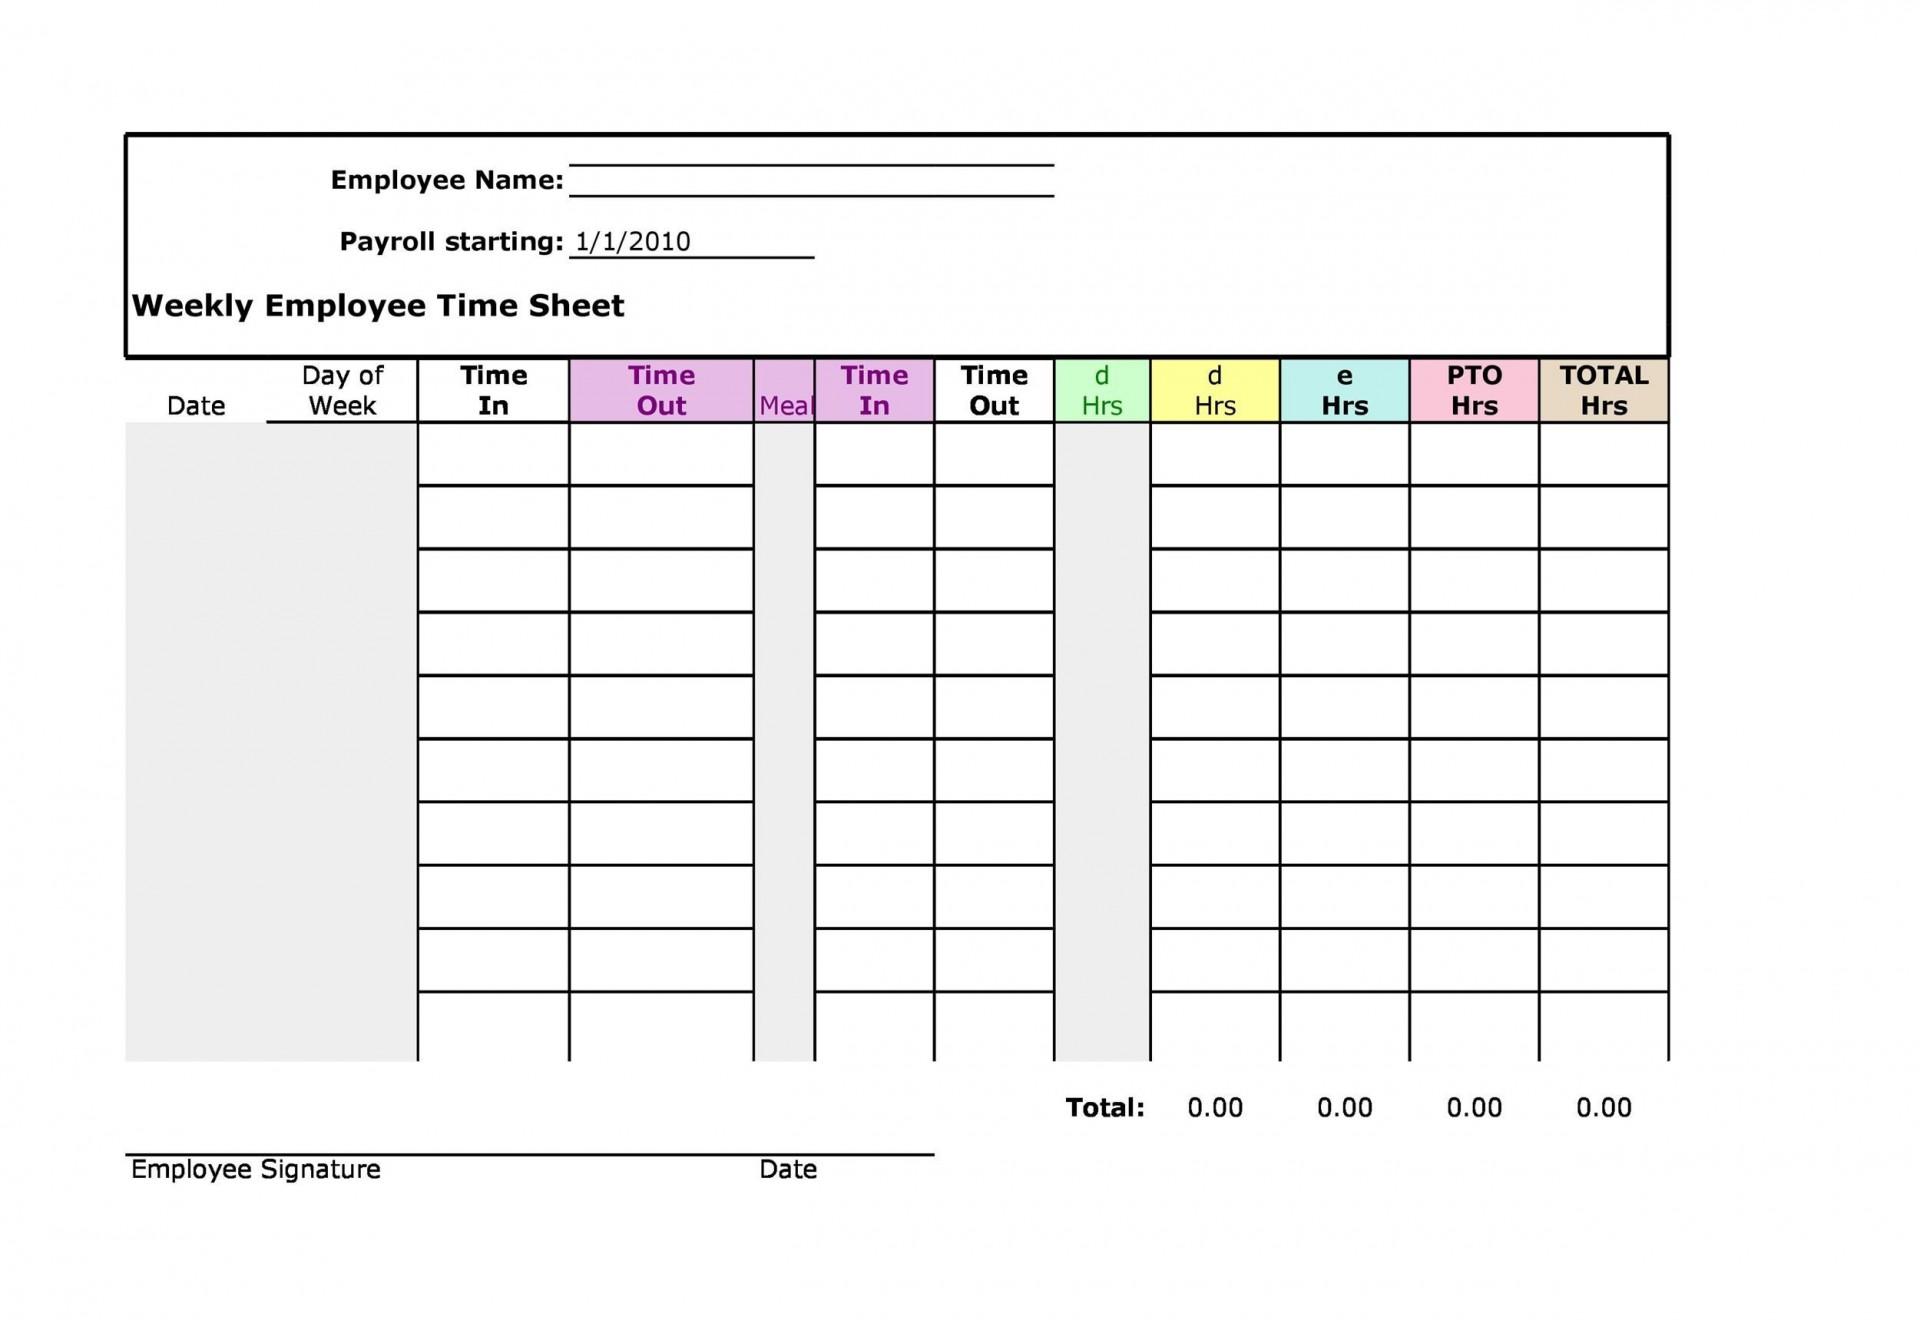 008 Staggering Multiple Employee Timesheet Template Idea  Schedule Job Excel1920